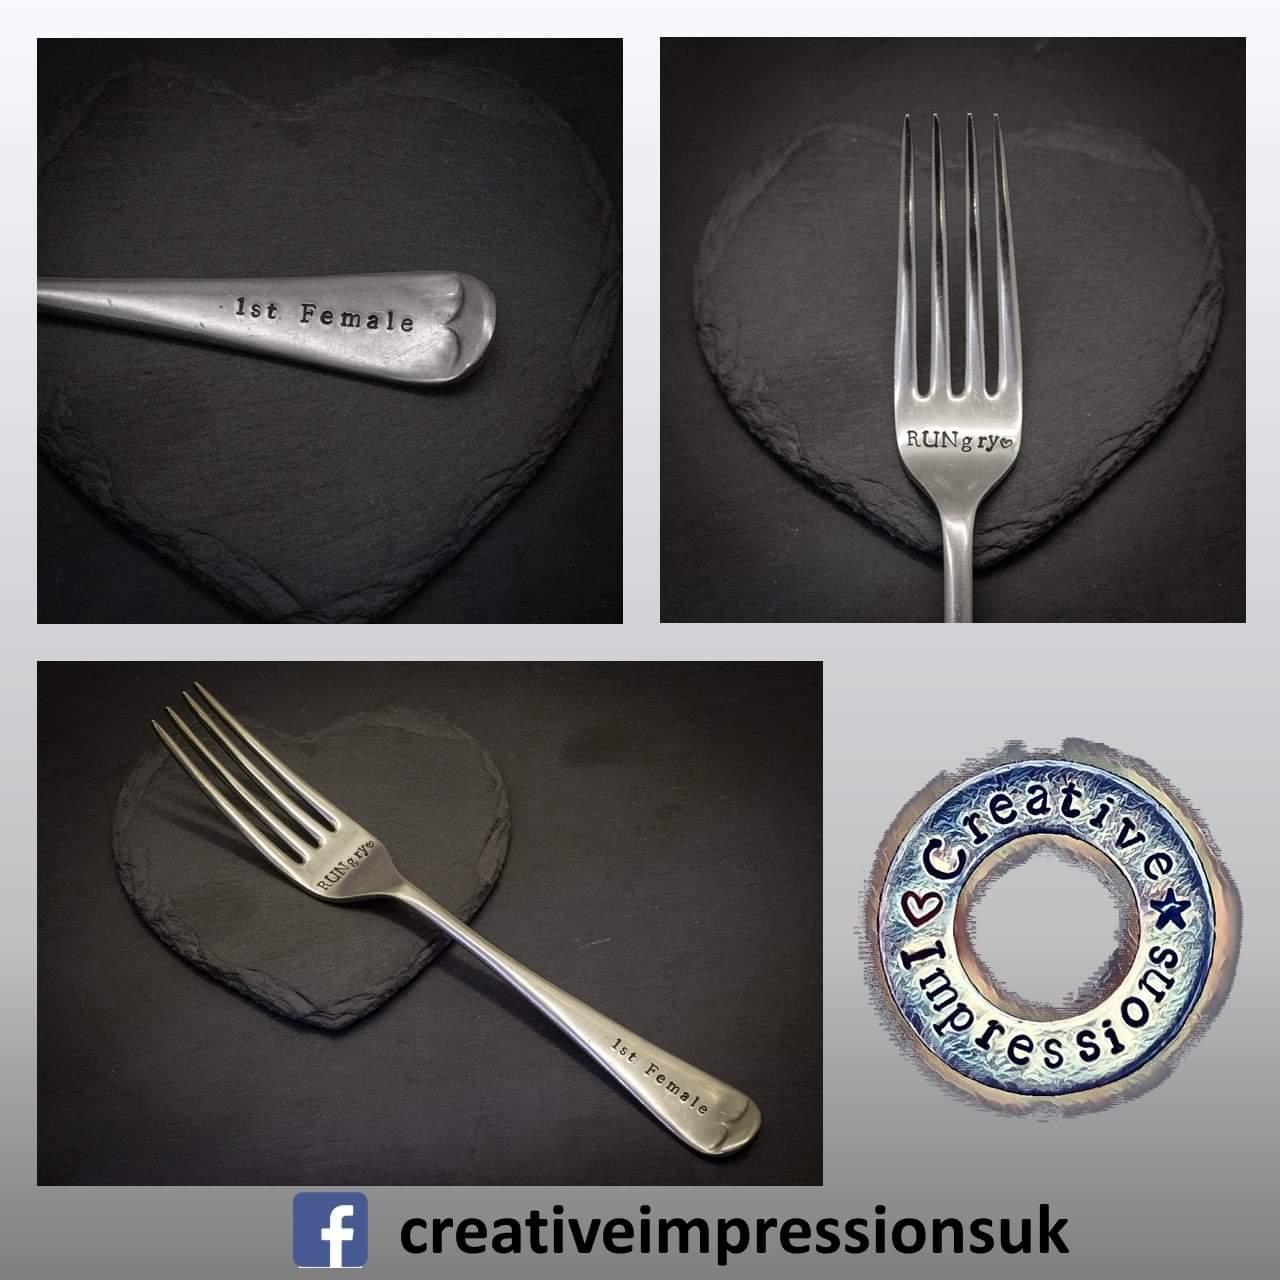 Special prize forks